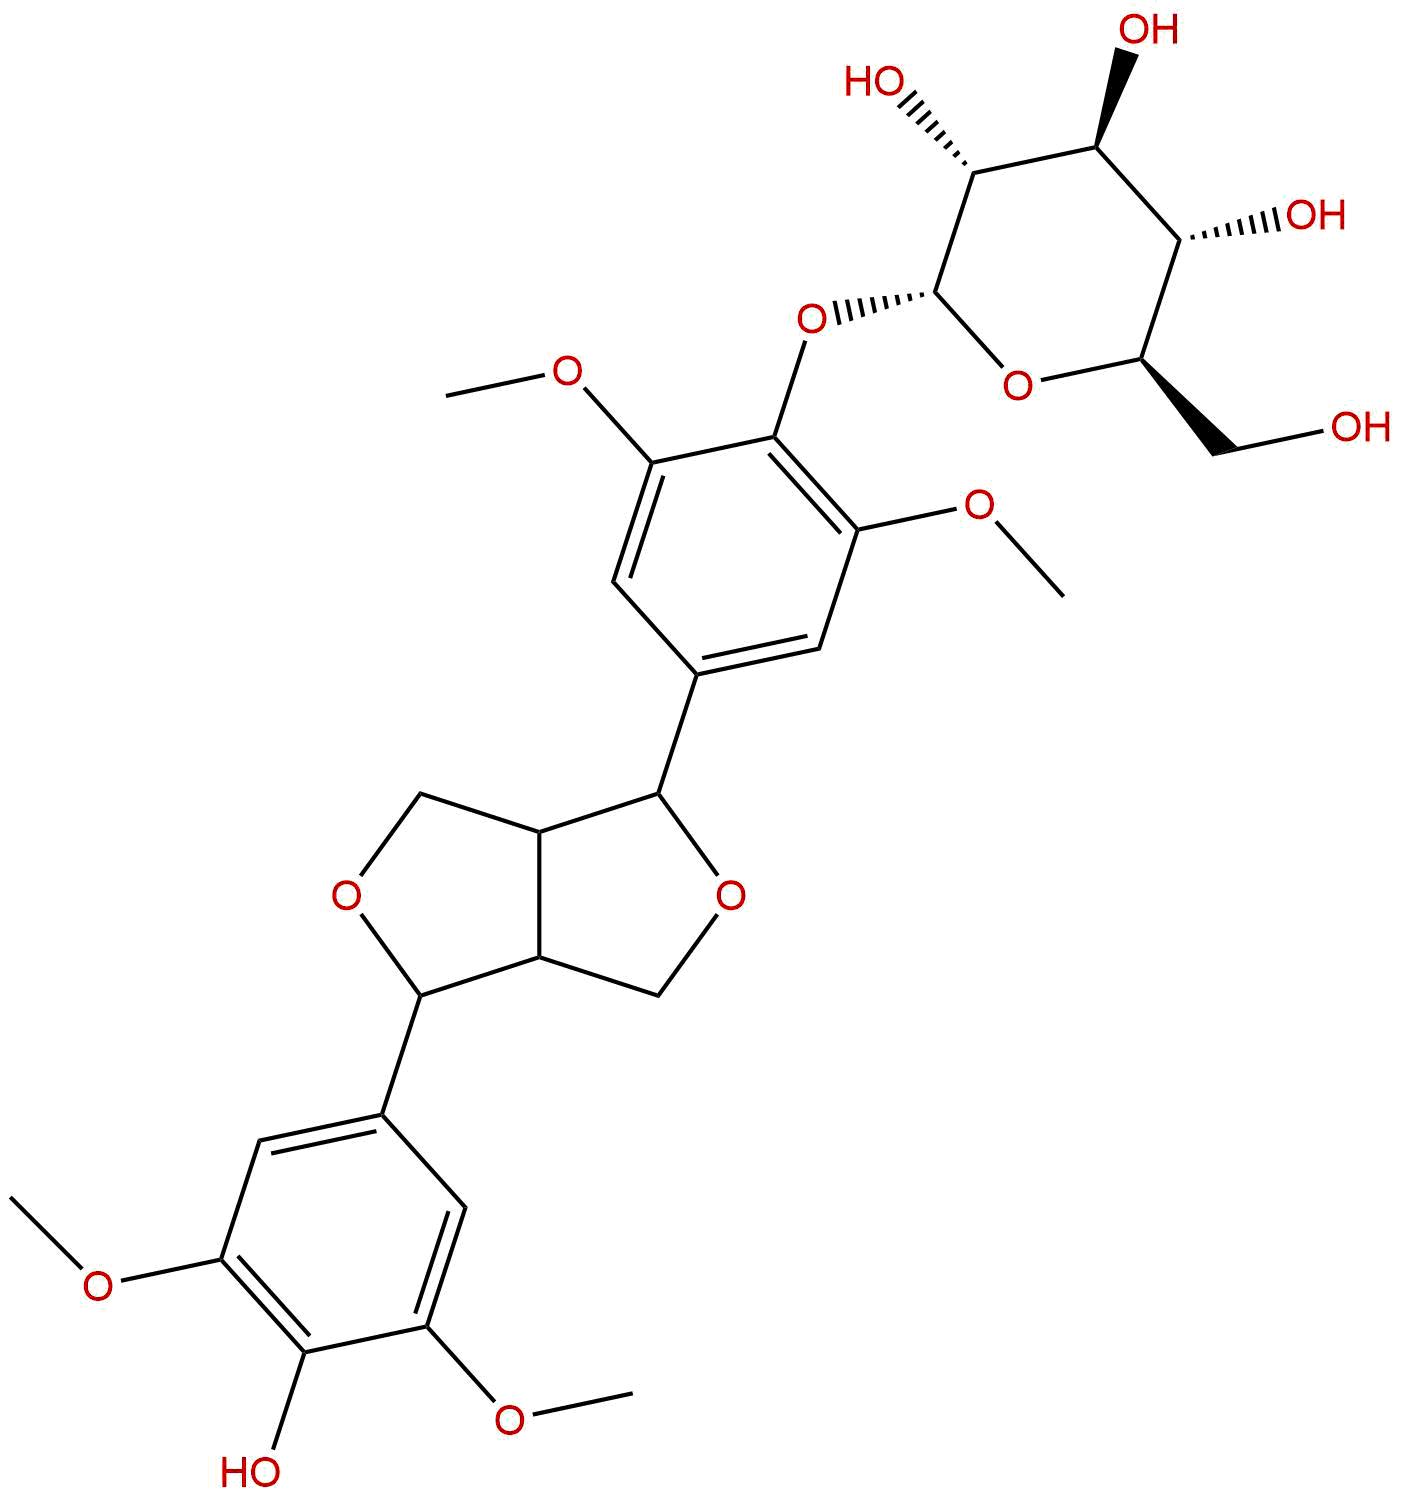 Episyringaresinol 4'-O-β-D-glncopyranoside